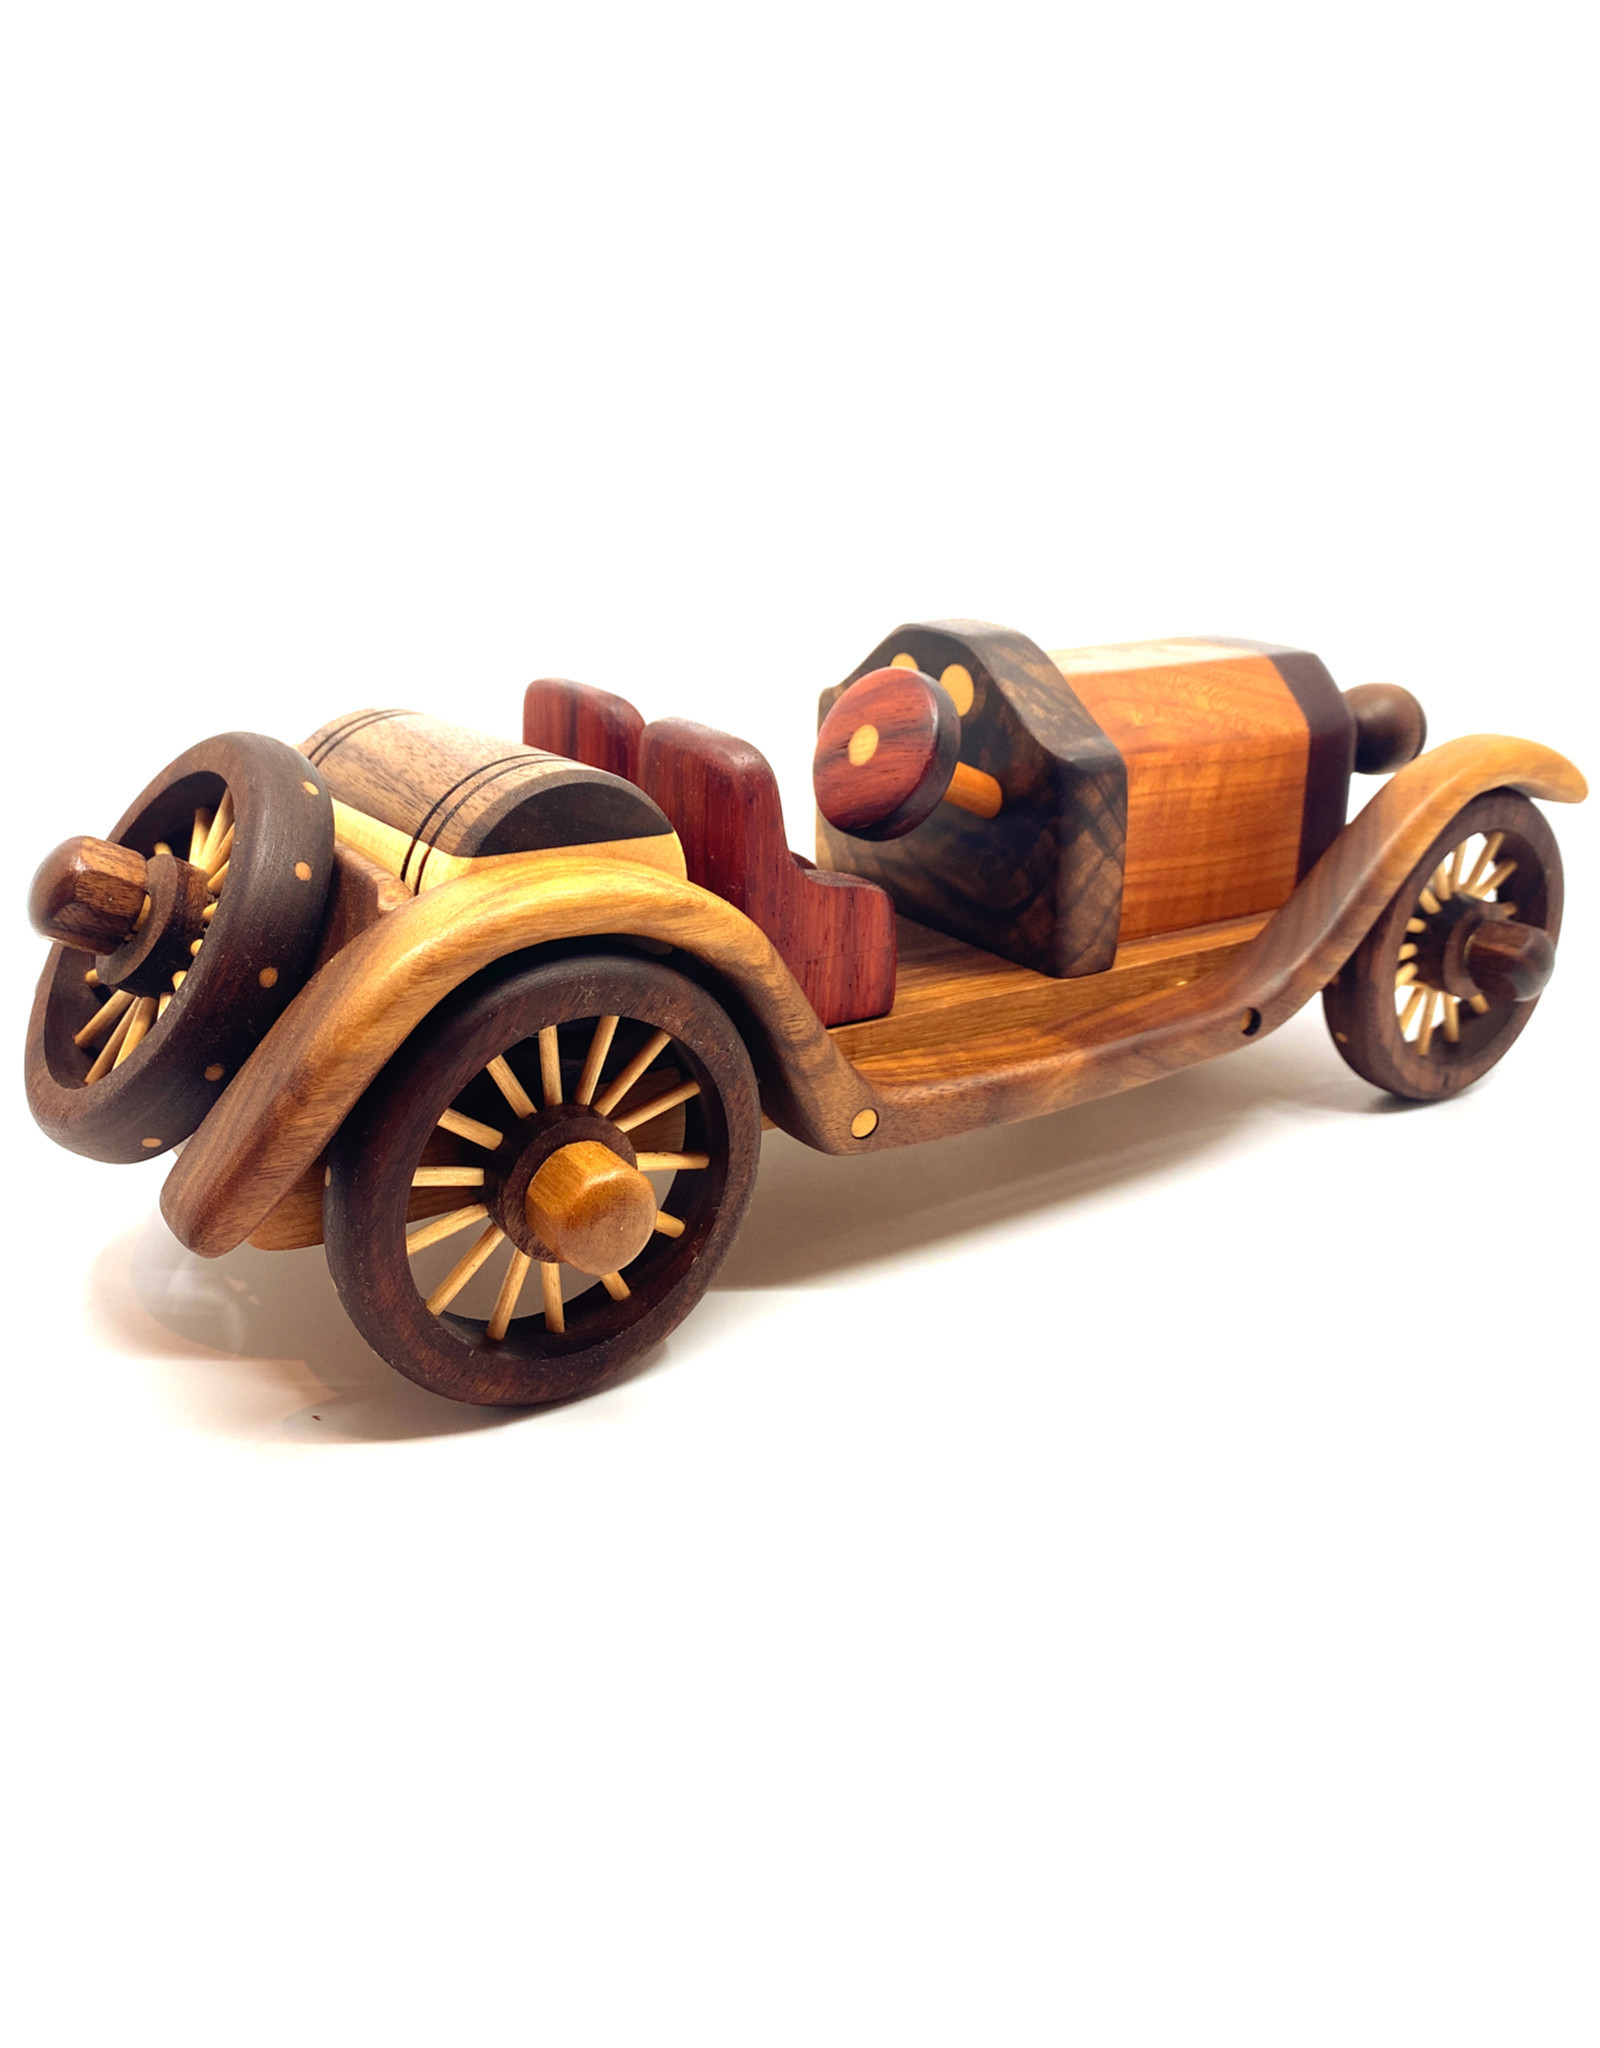 BALDWIN TOYS STUTZ BEARCAT CAR